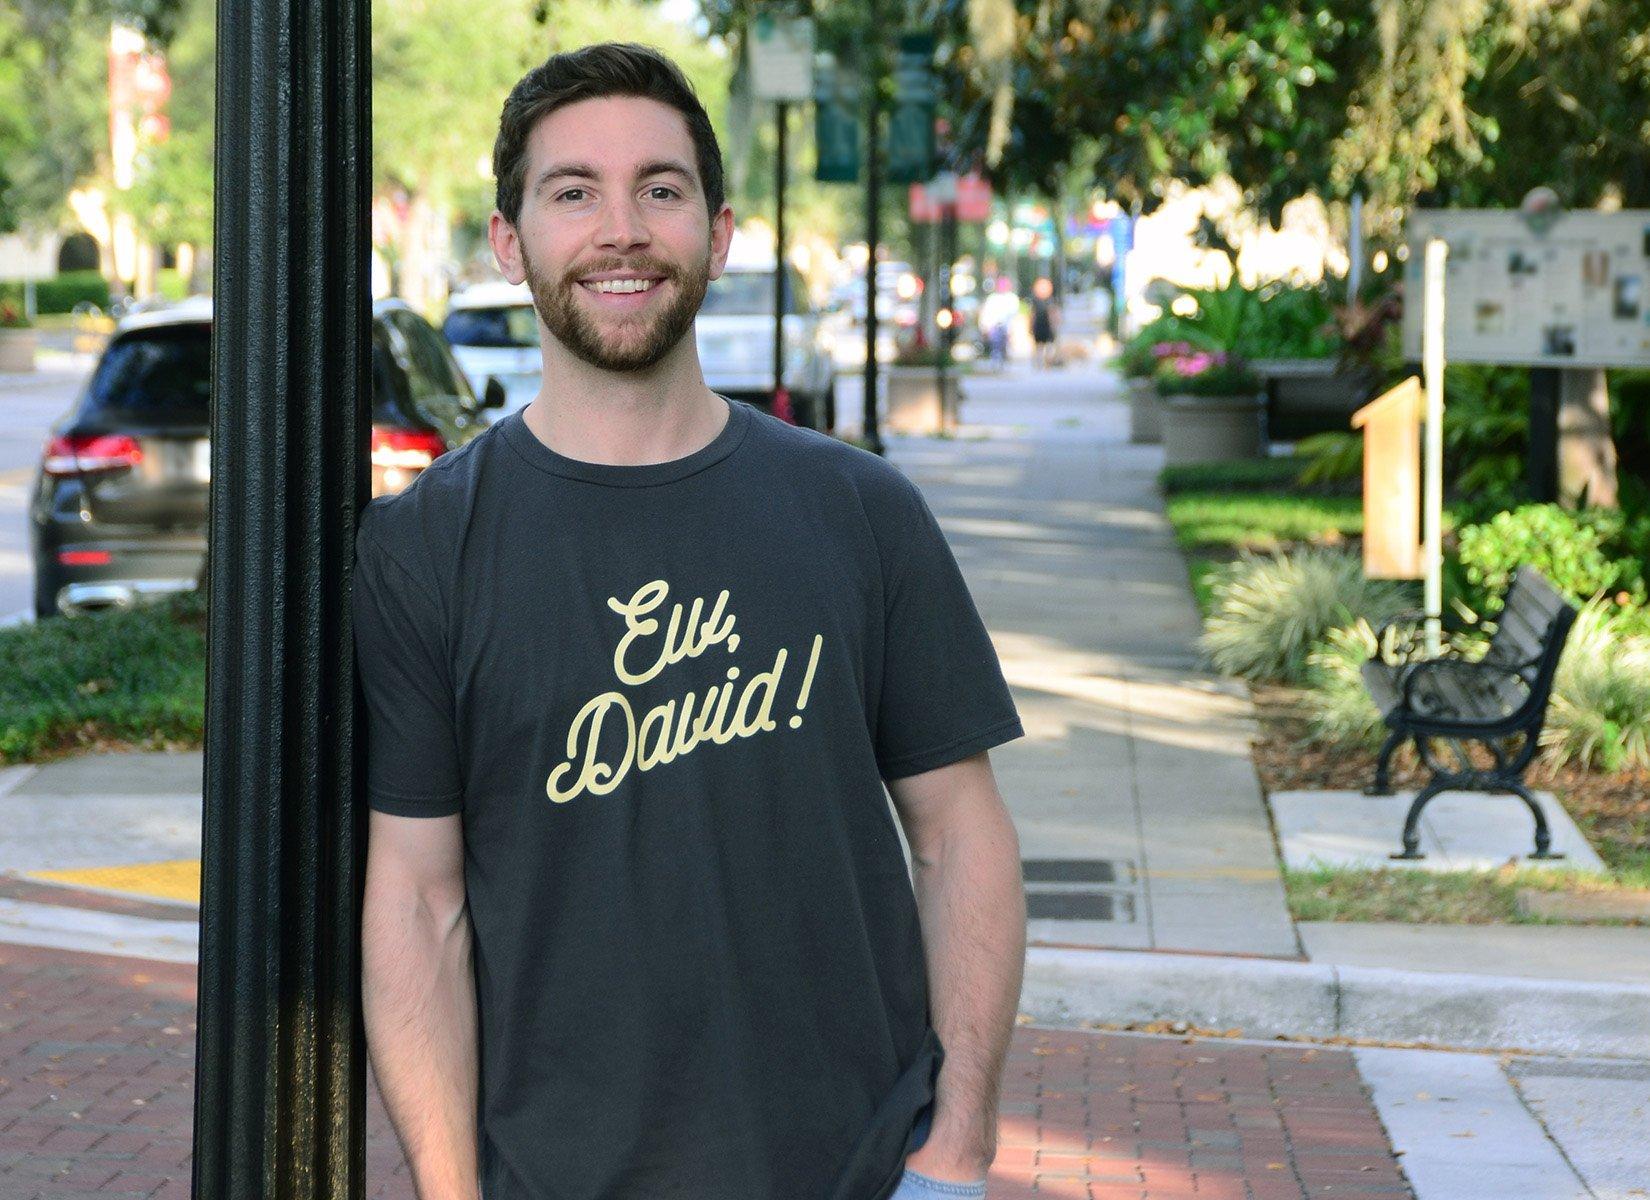 Ew, David! on Mens T-Shirt